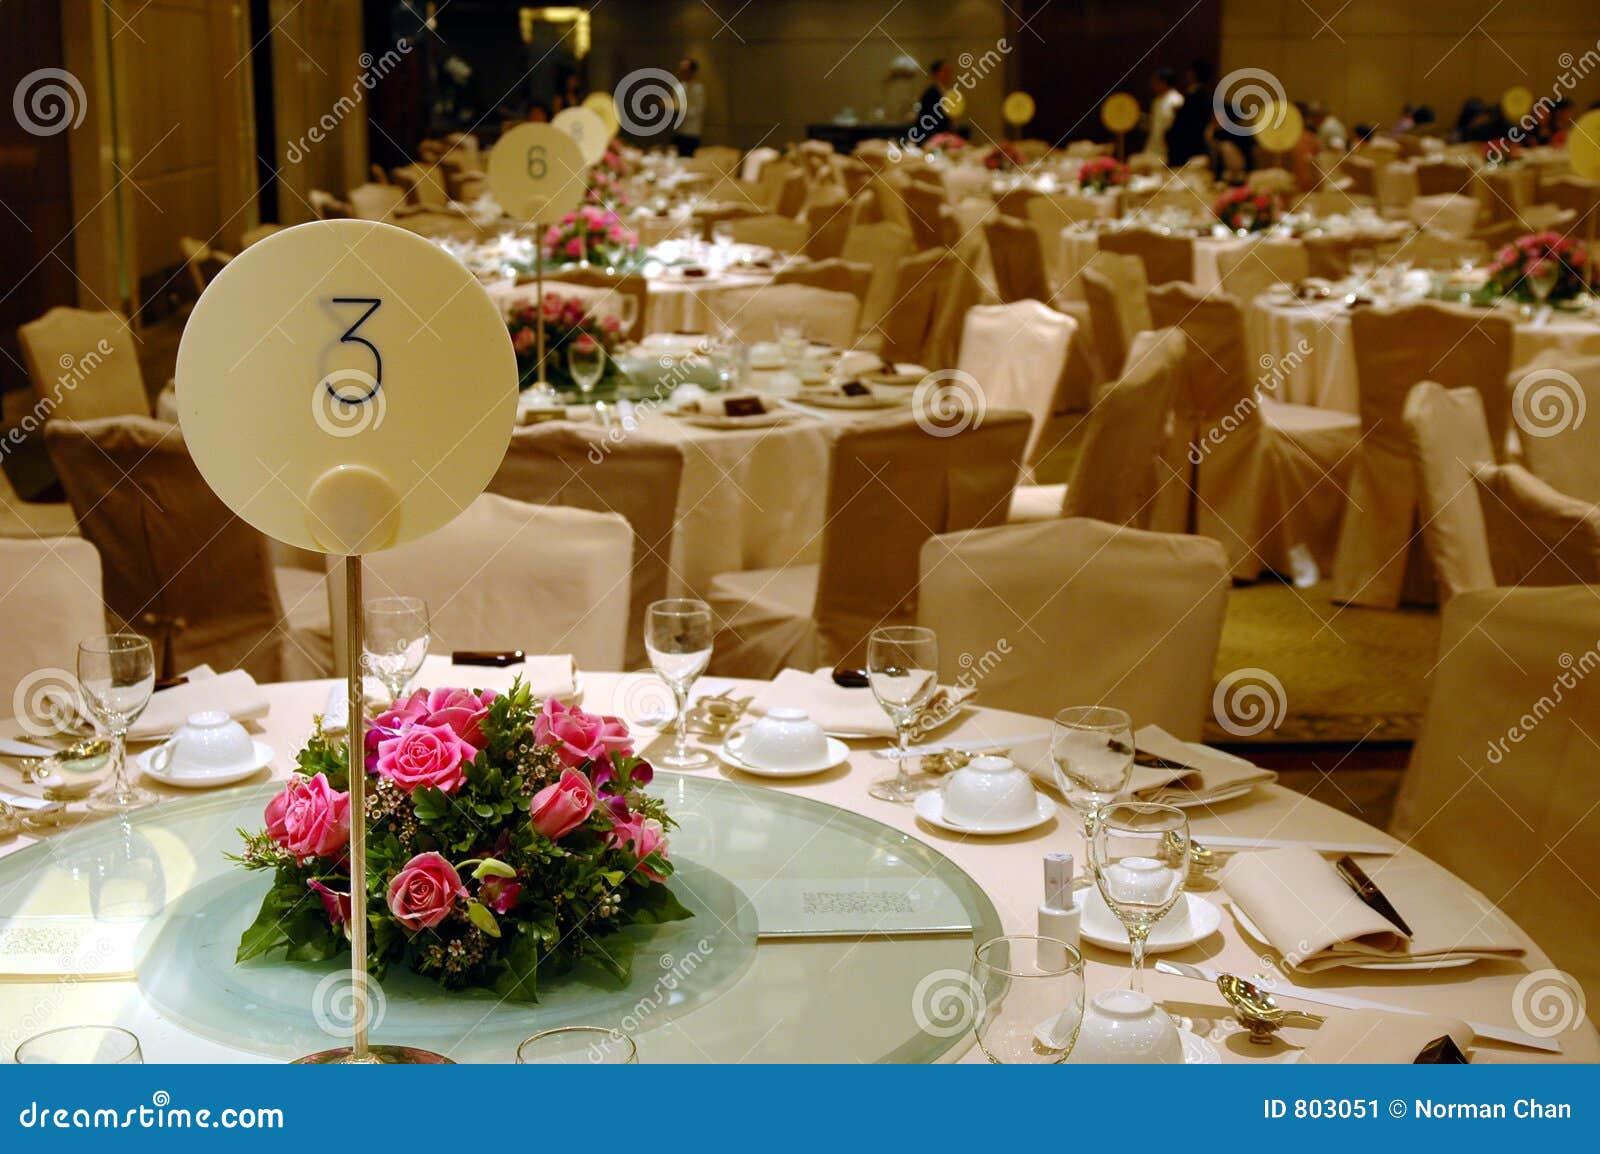 Wedding Banquet Table Setting Stock Image Image 803051